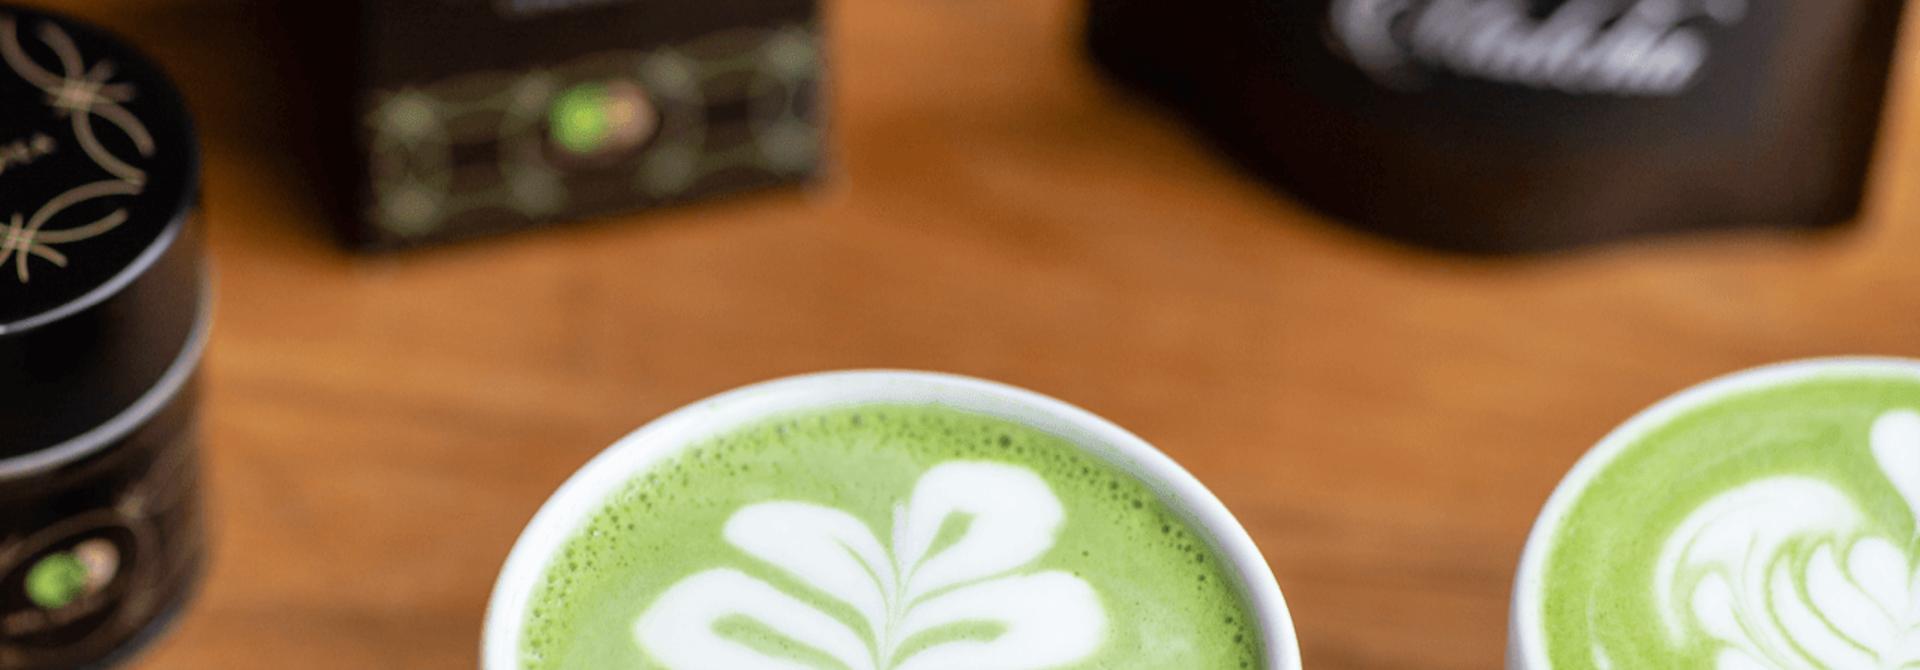 Matcha Latte en Cooking